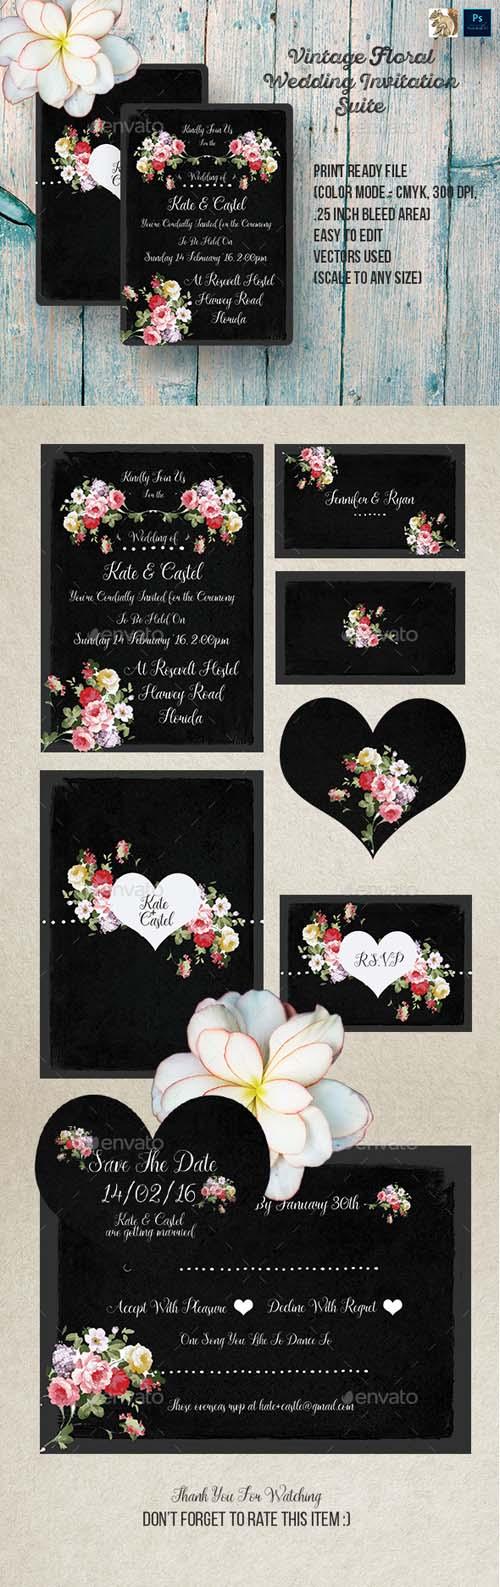 Vintage Floral Wedding Invitation Suite 14447556